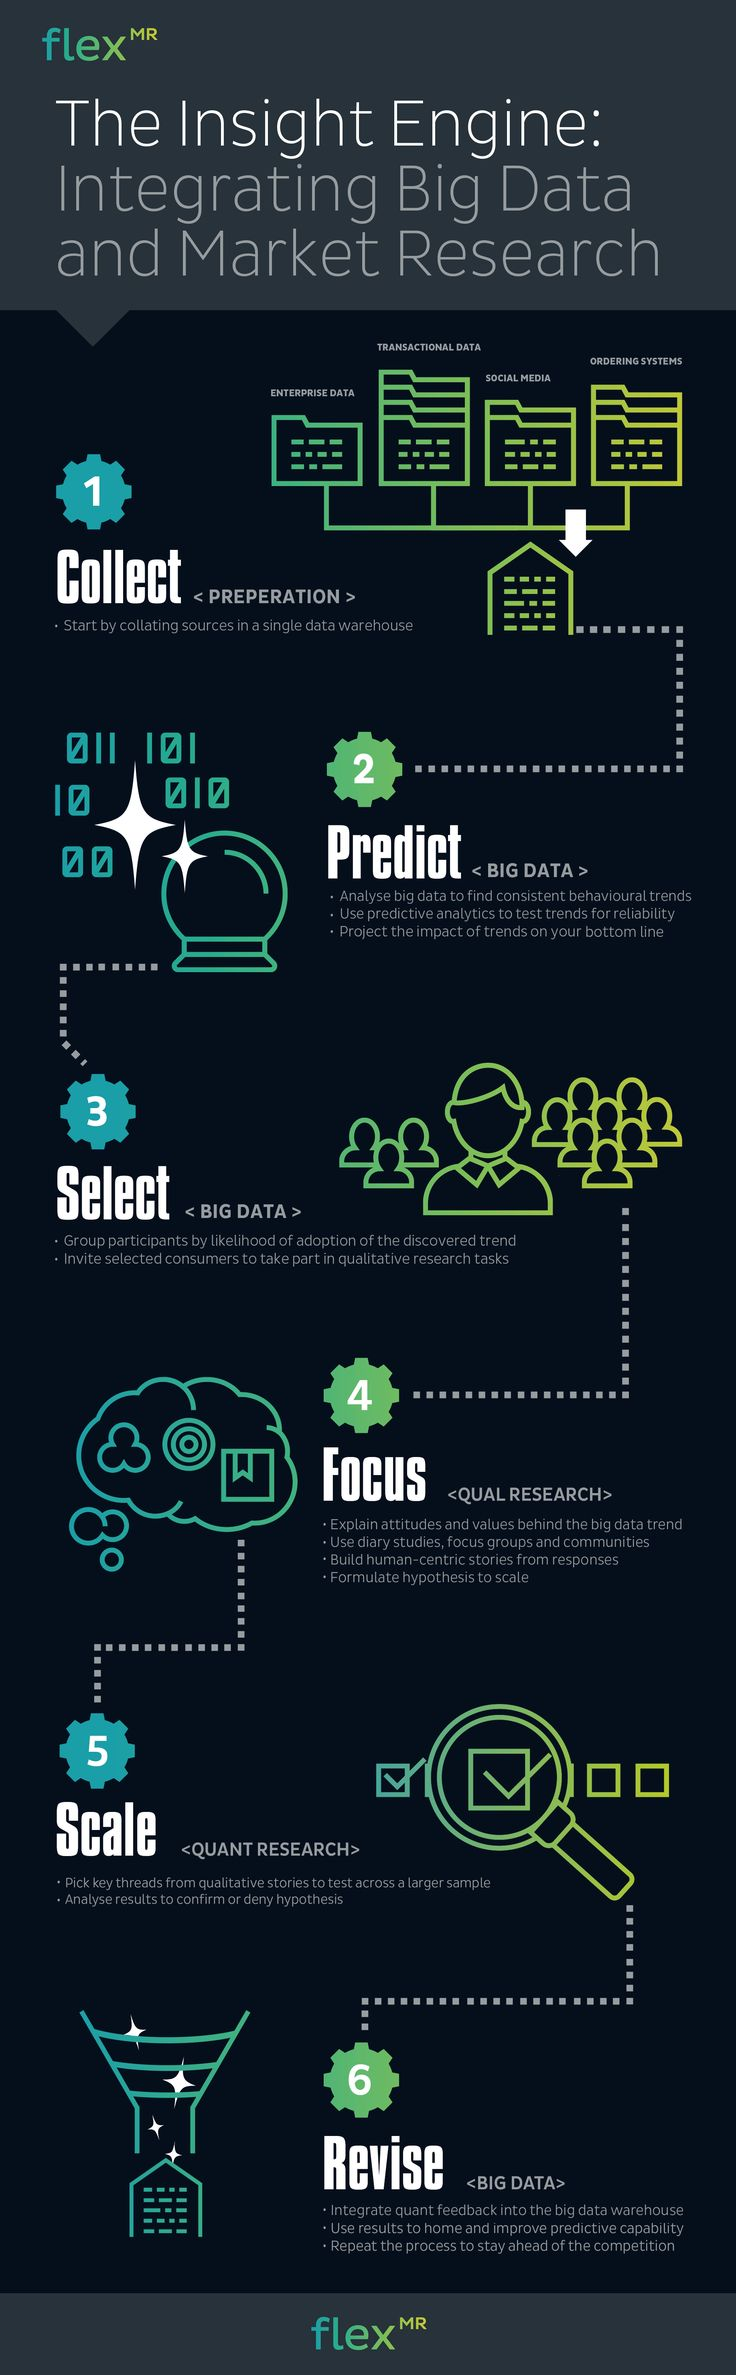 6 Steps to Integrating Big Data u0026